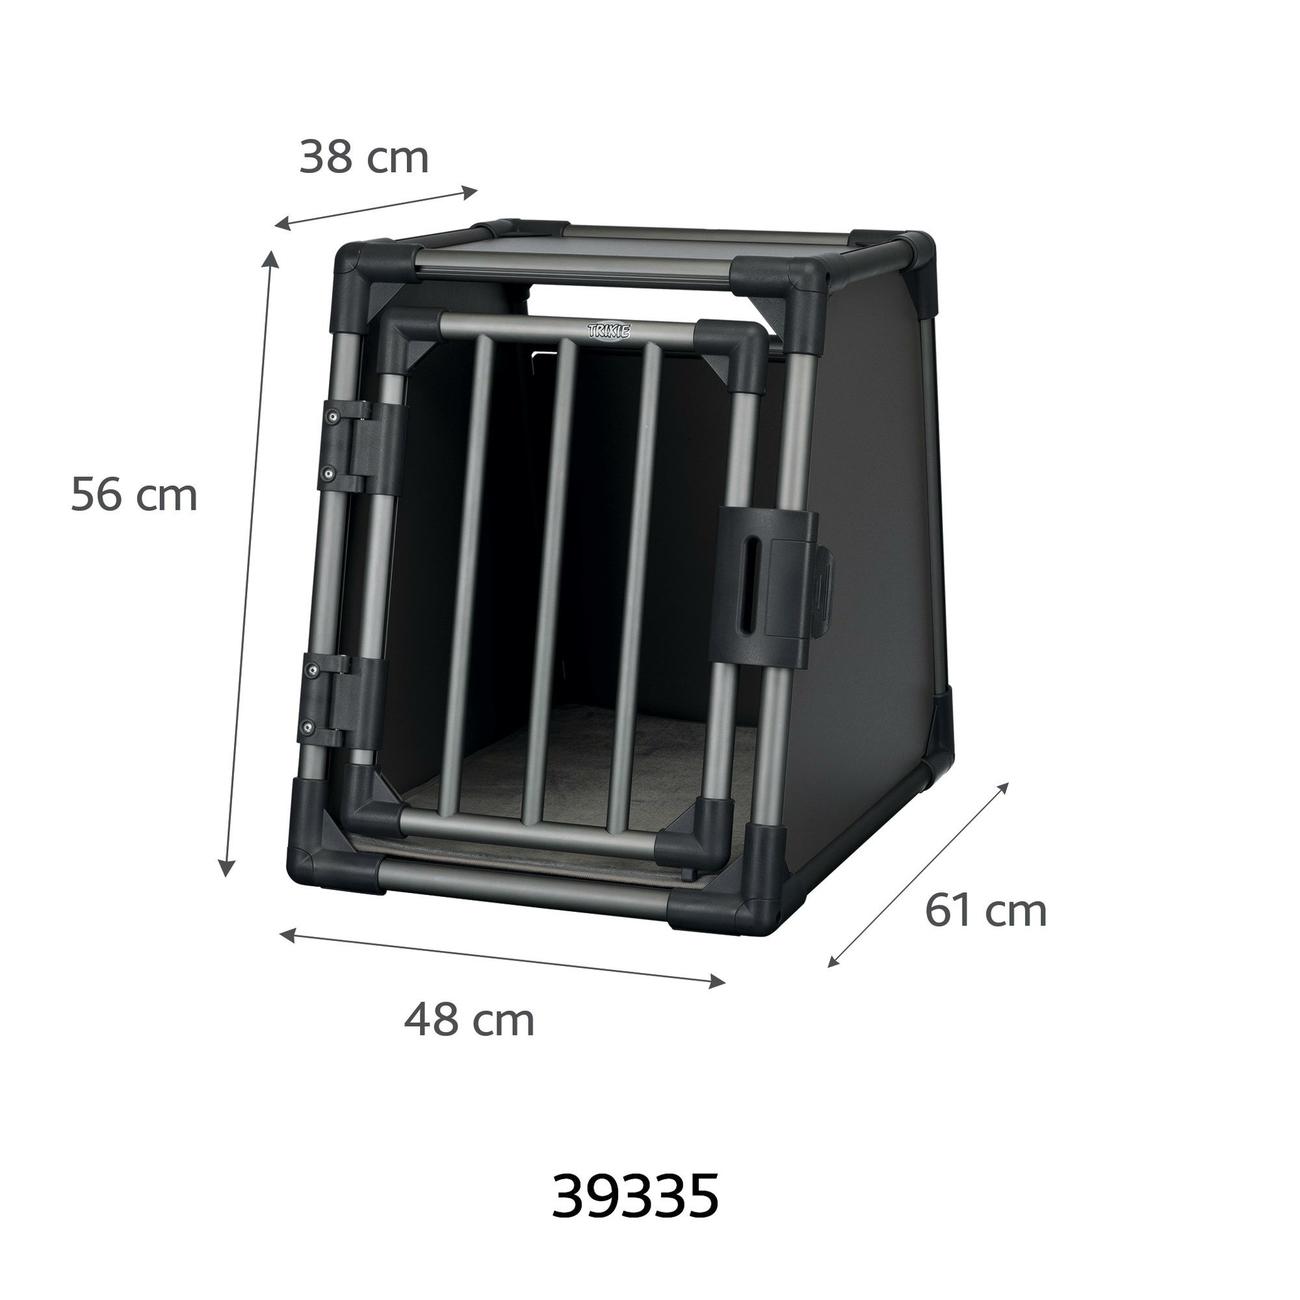 Trixie Autobox für Hunde aus Aluminium, graphit 39335, Bild 2